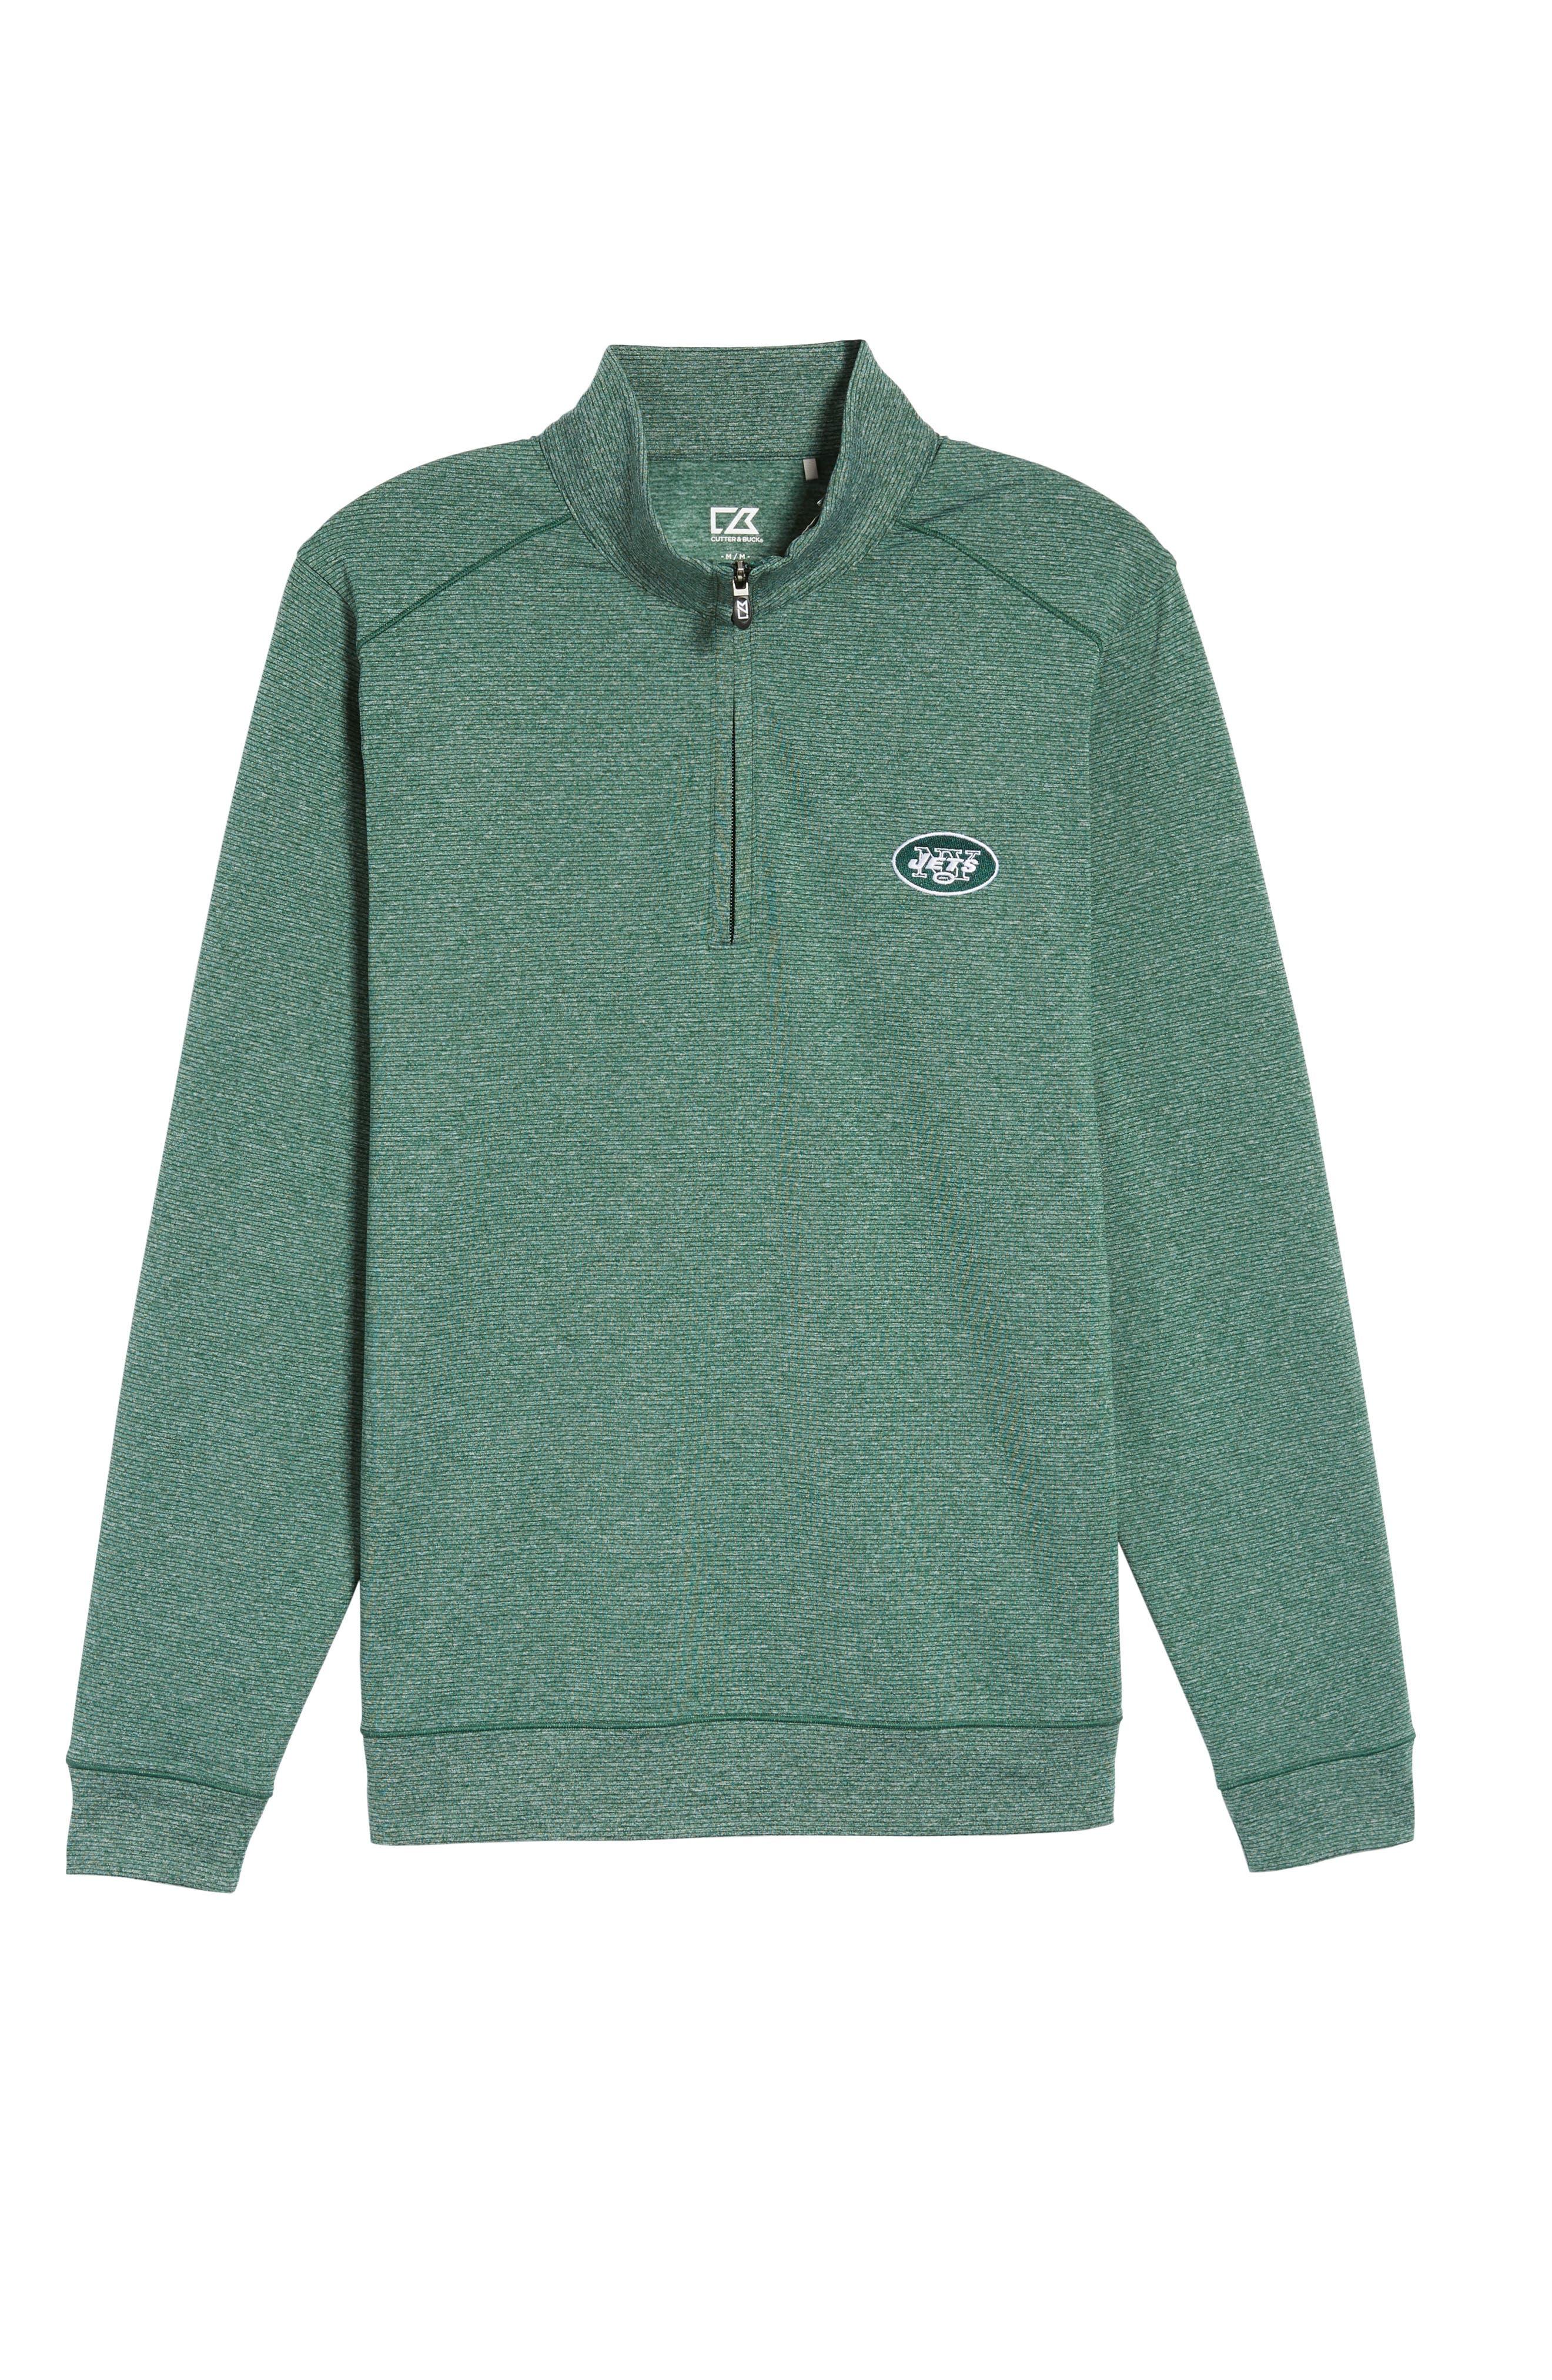 Shoreline - New York Jets Half Zip Pullover,                             Alternate thumbnail 6, color,                             308